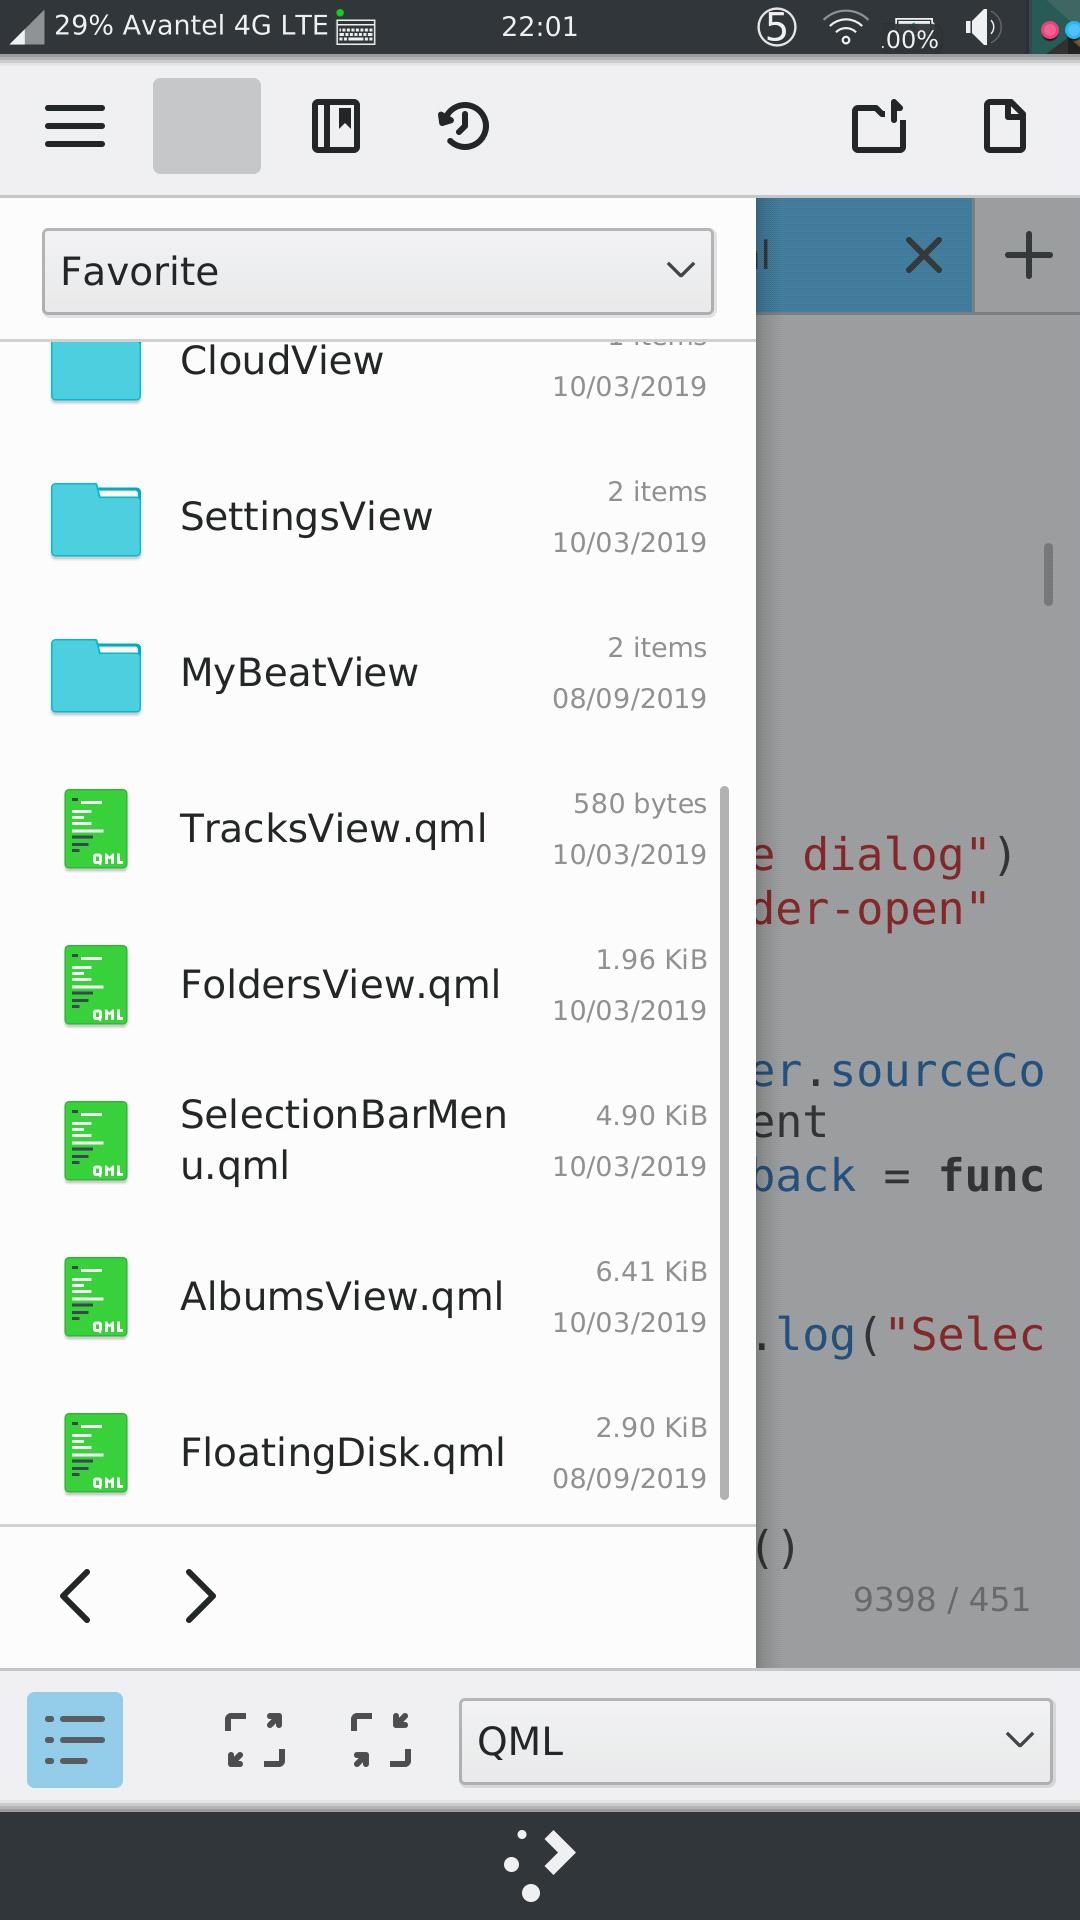 img/screenshots/index-favorites.png